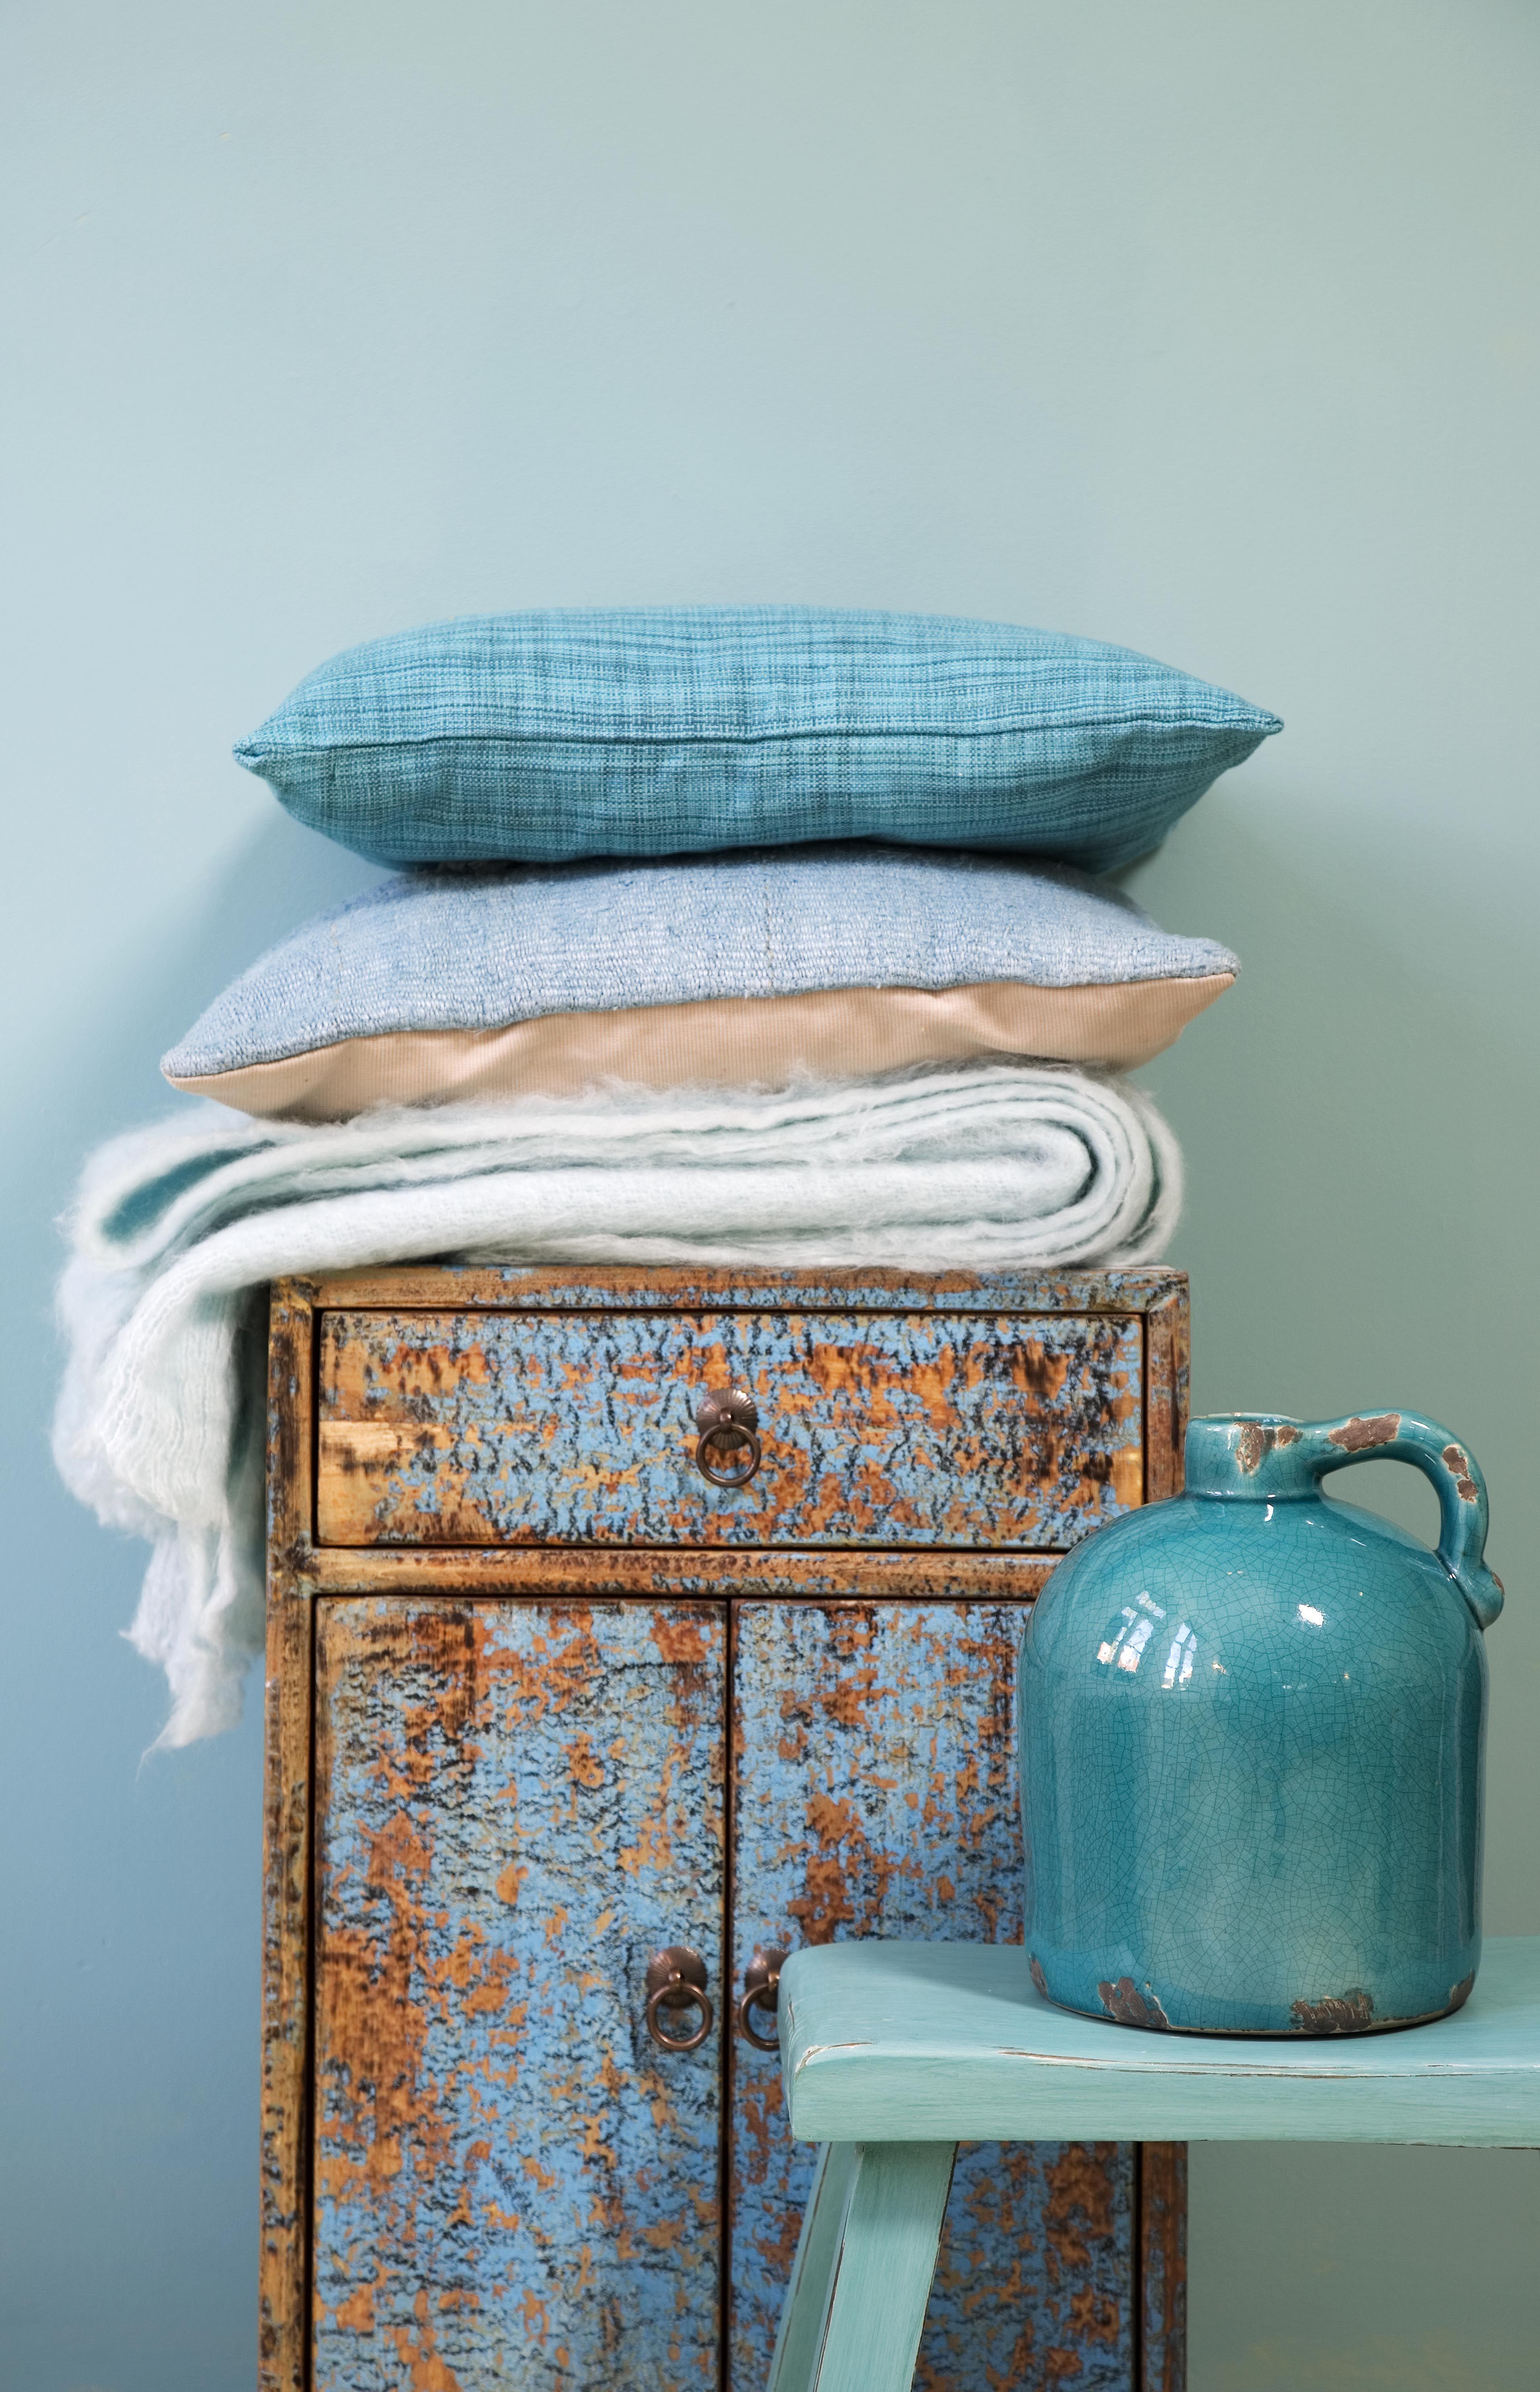 turquoise accesoires tinten blauw turkooise accessoires blauwe kleuren blauw en wit gooi